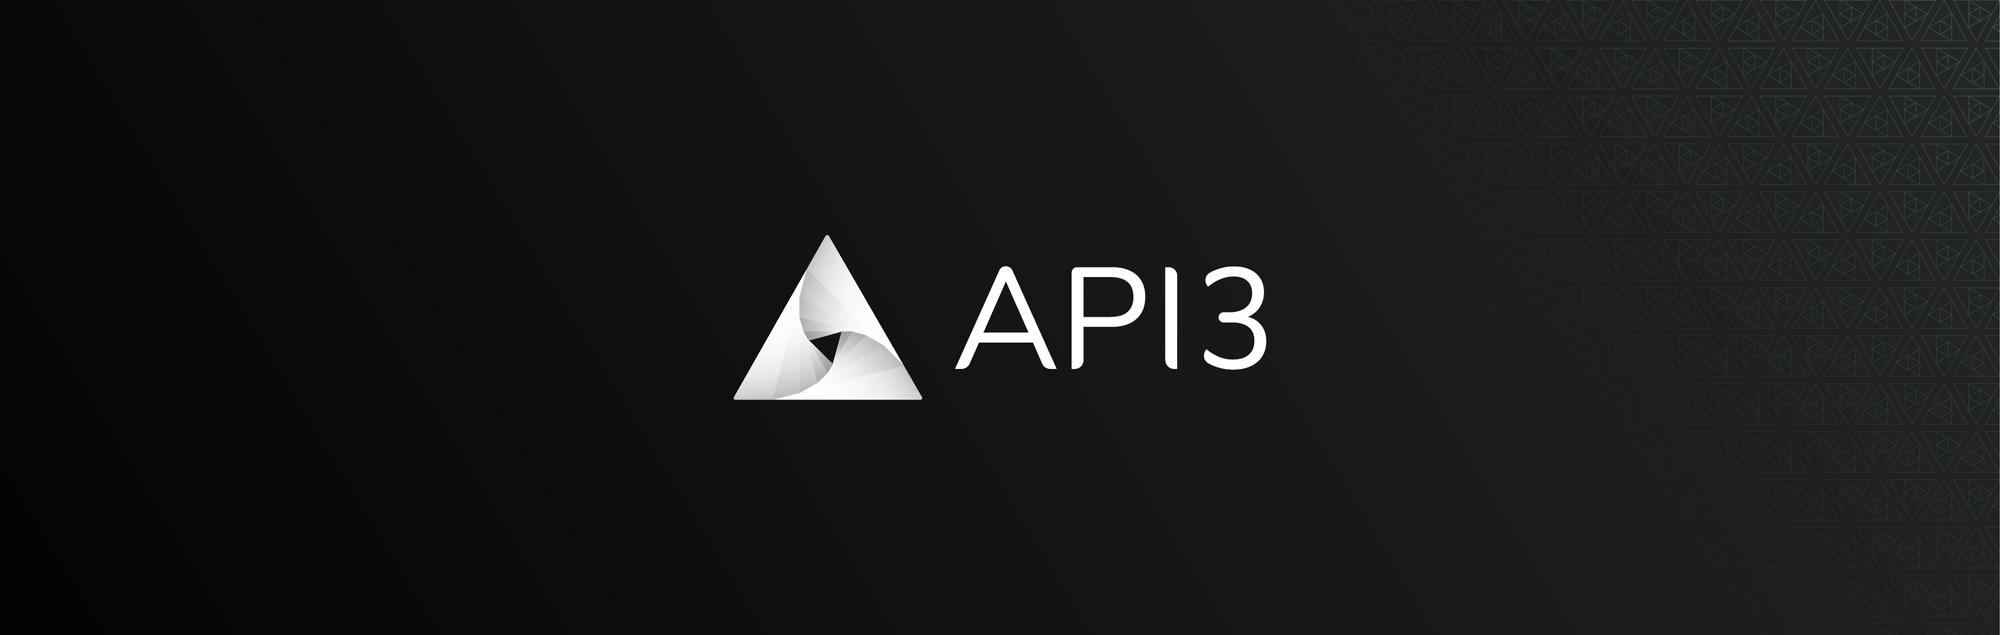 API3 即将启动公募